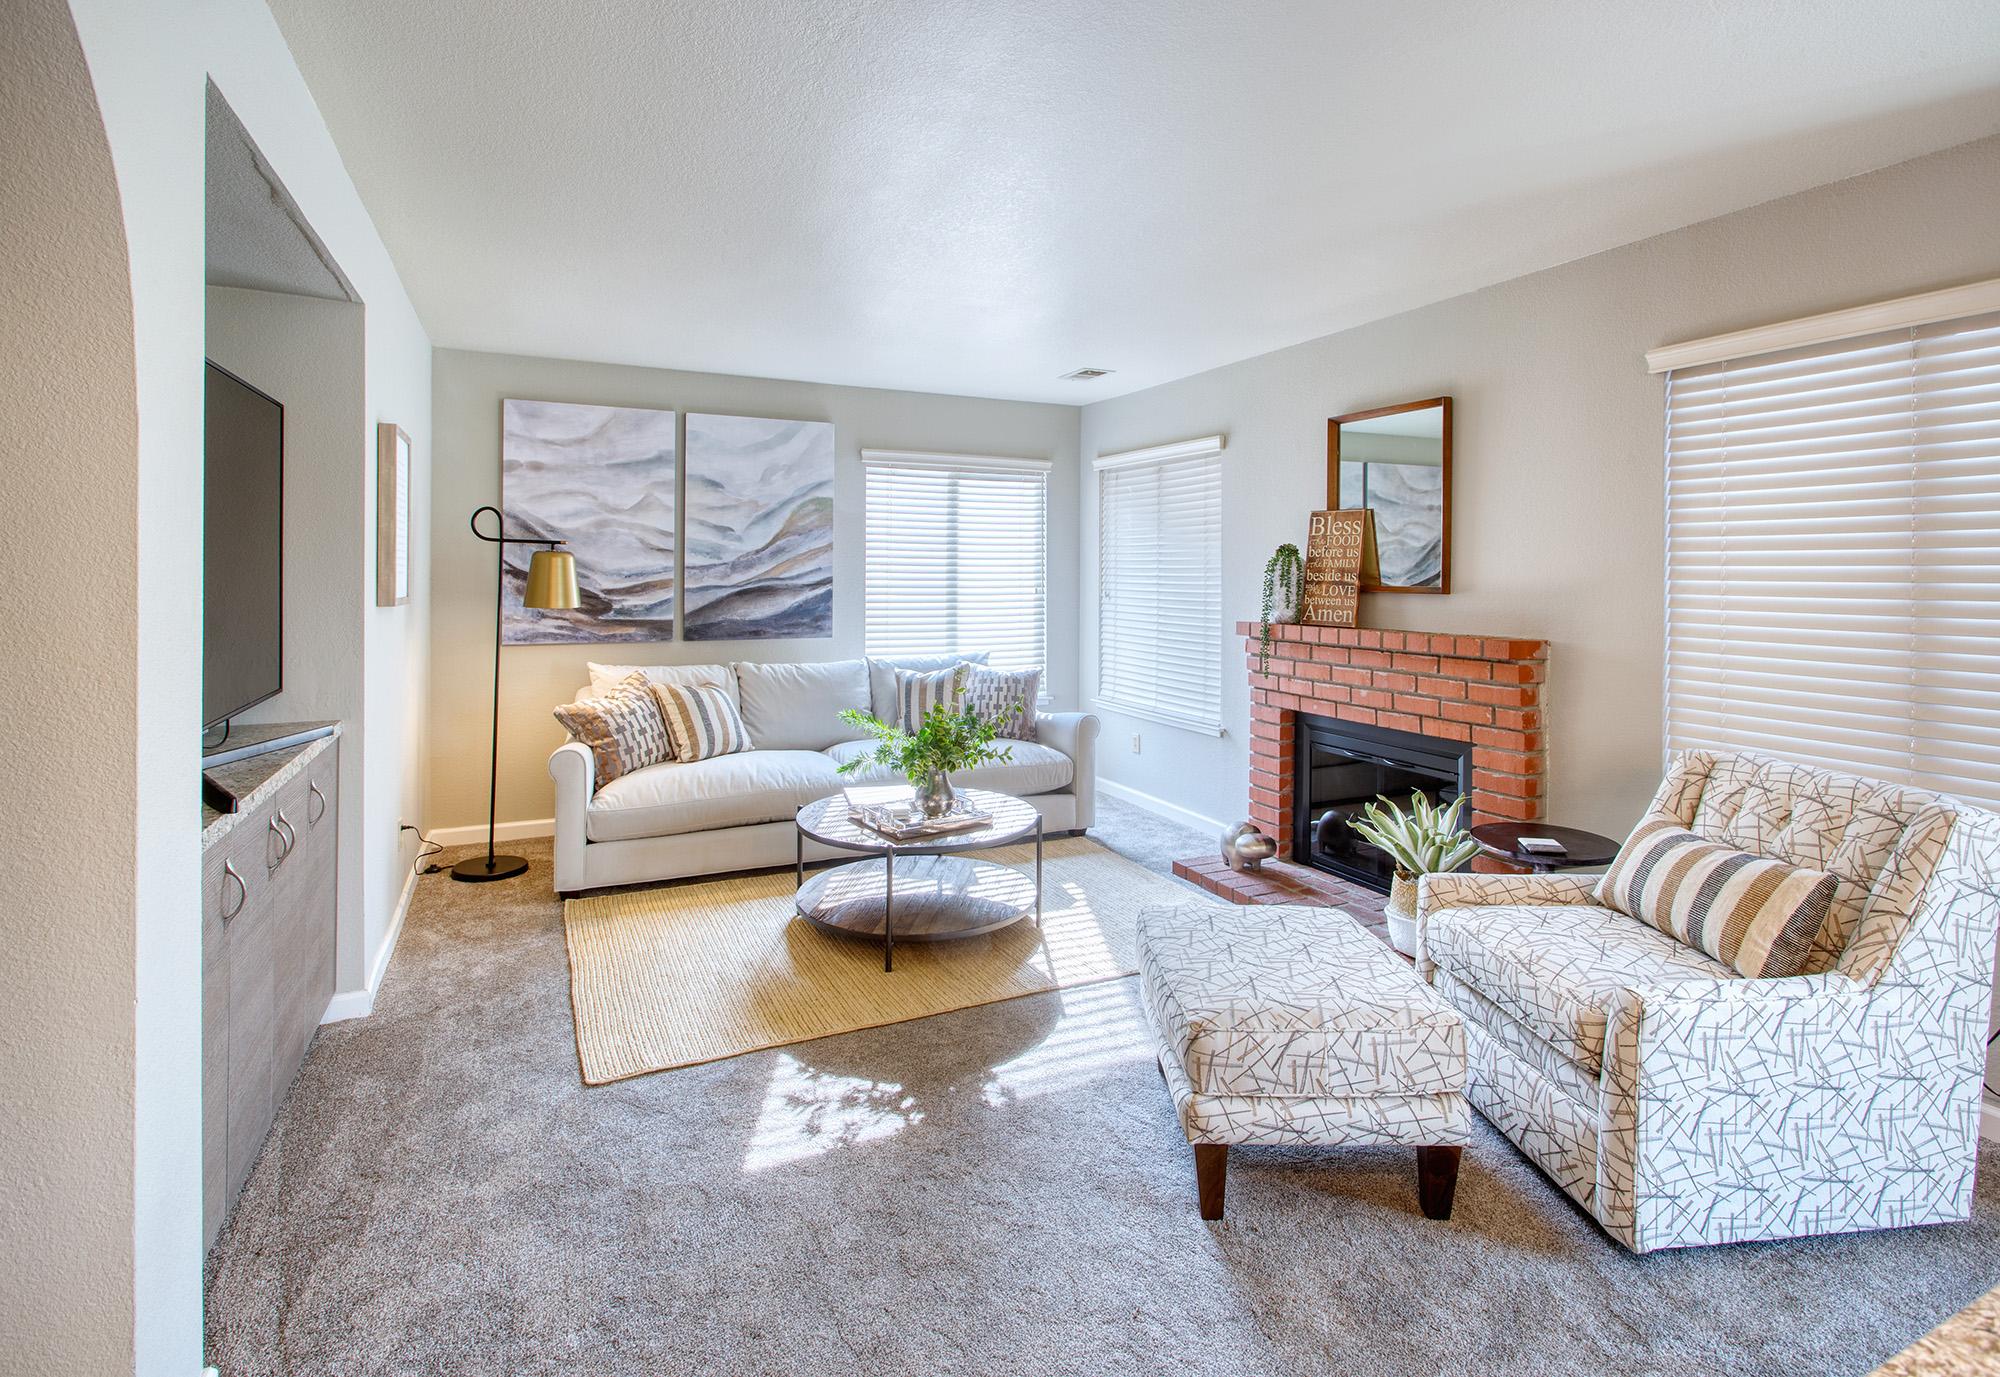 living-room-interior-design-tracy-ca-ktj-design-co-kathleen-jennison.jpg